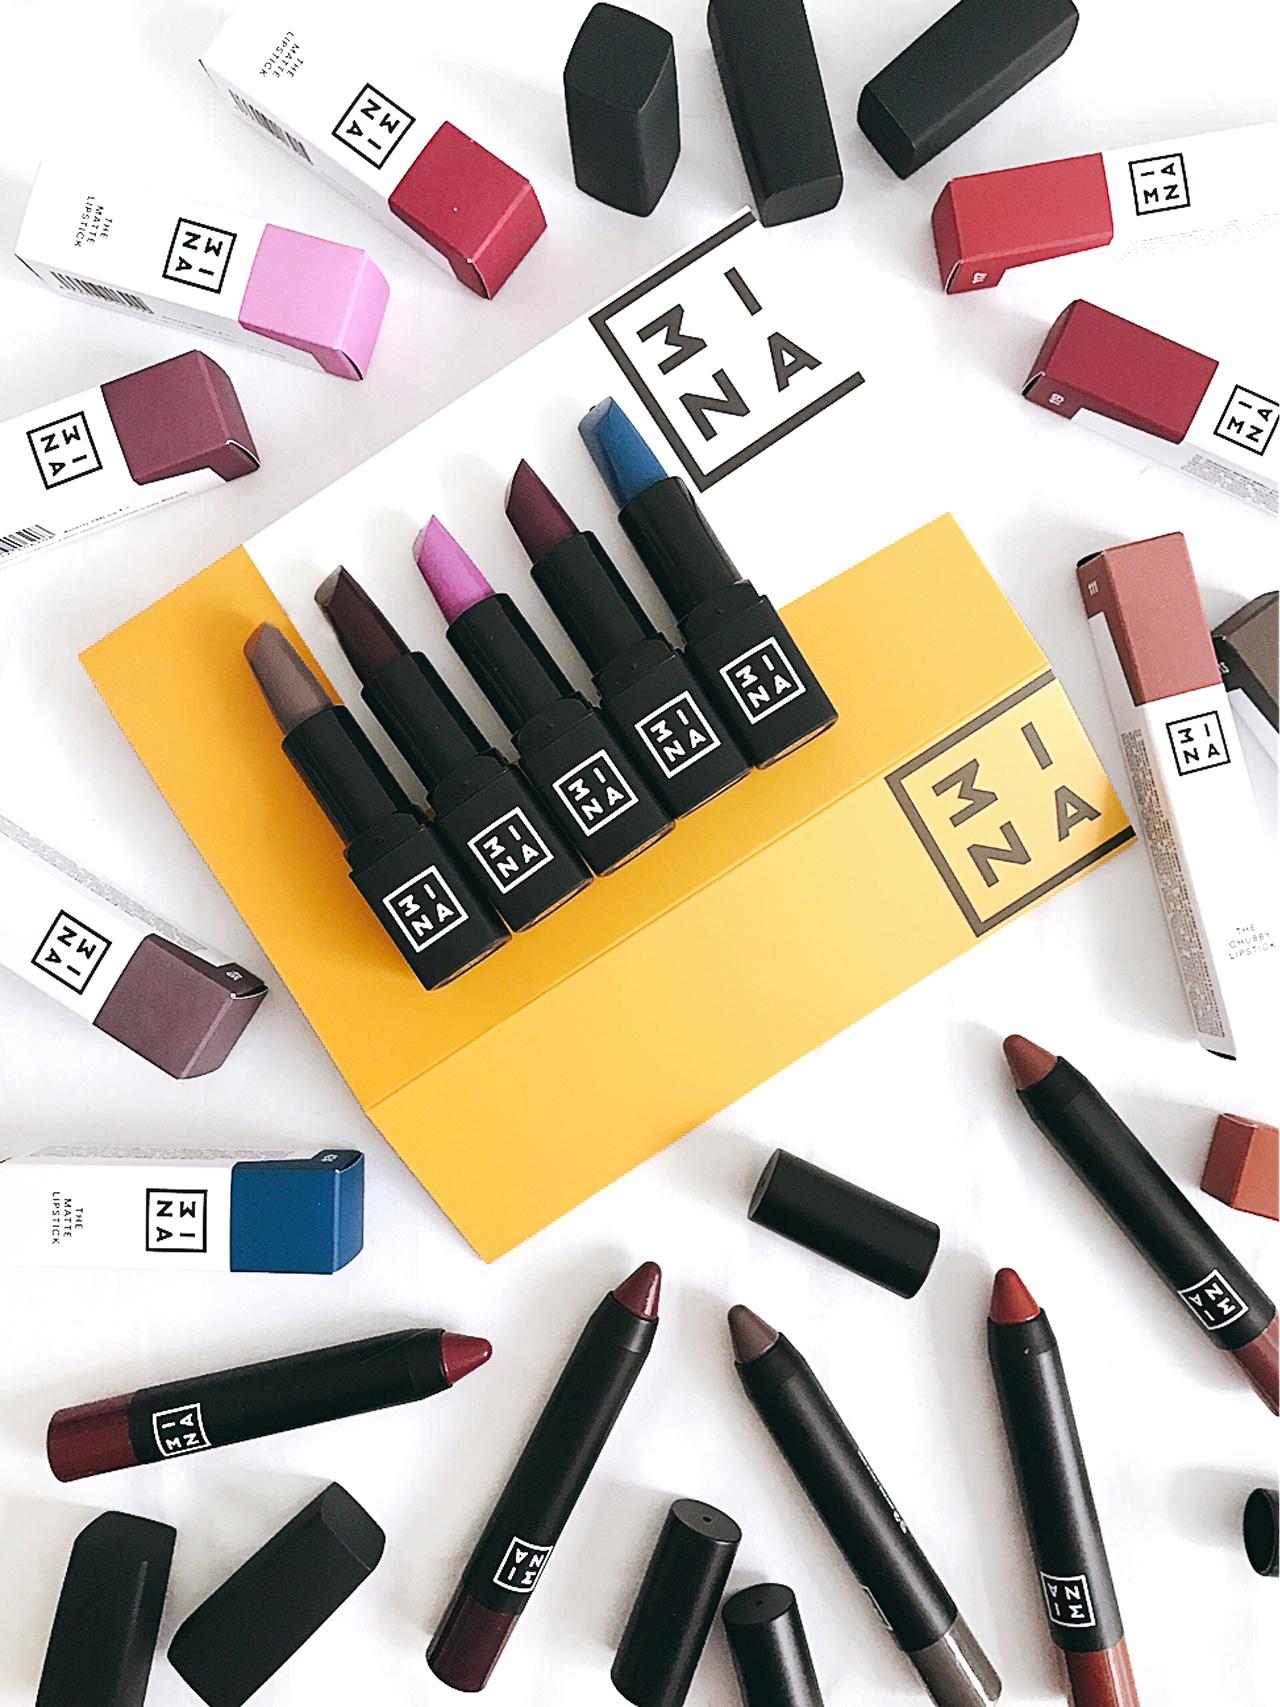 3ina The matte lipstick & the chubby lipstick